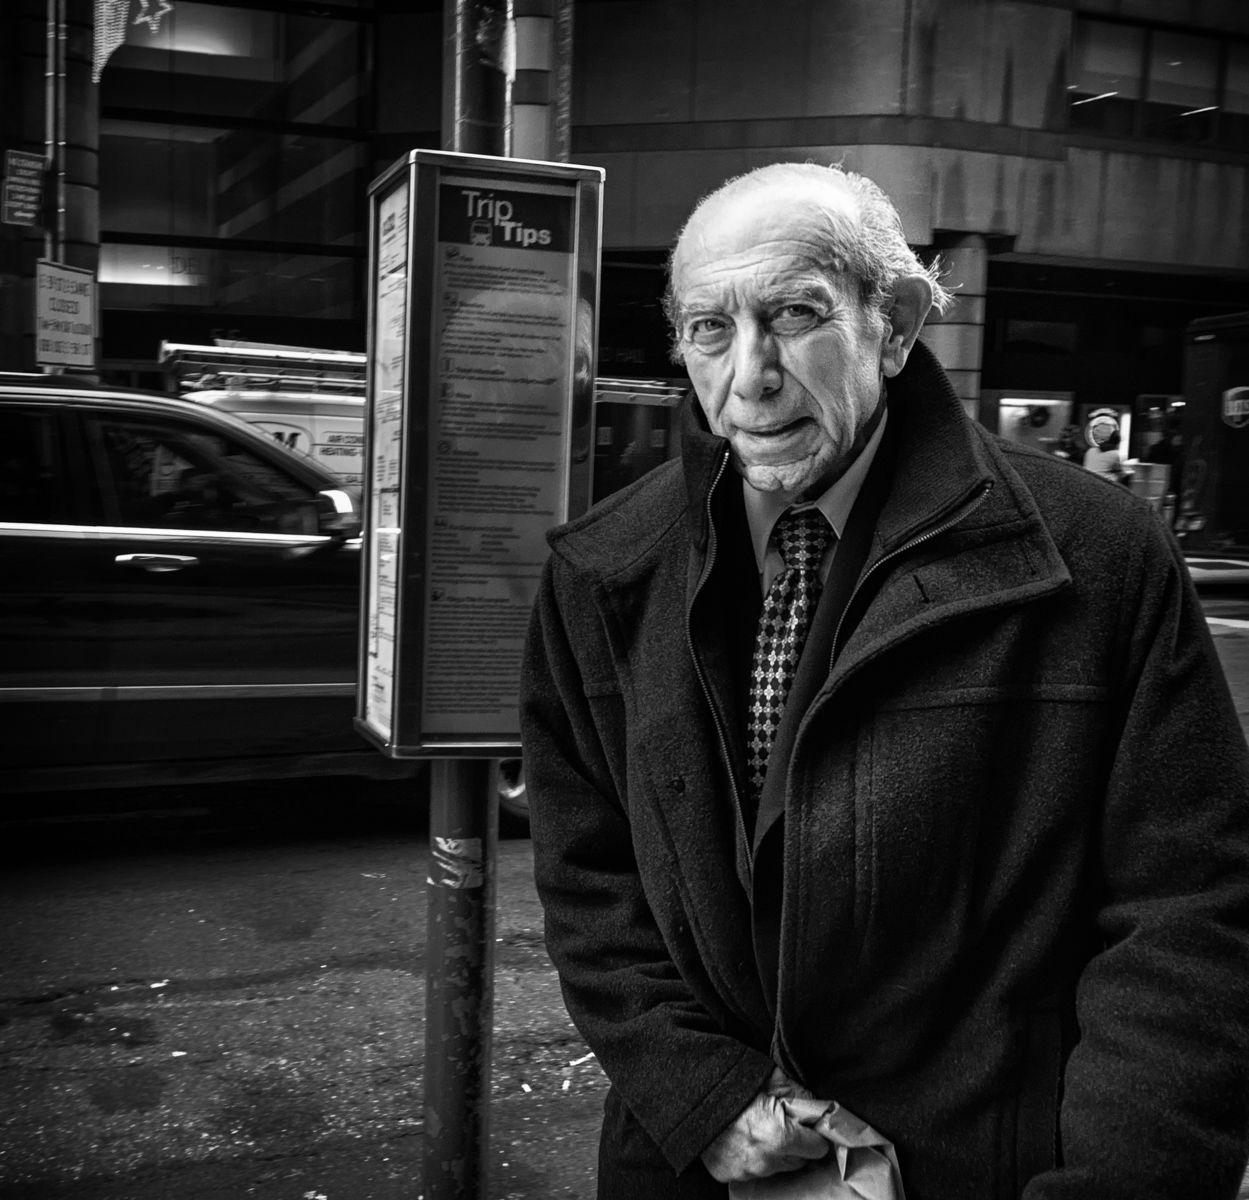 Manhattan, New York  01/02/13